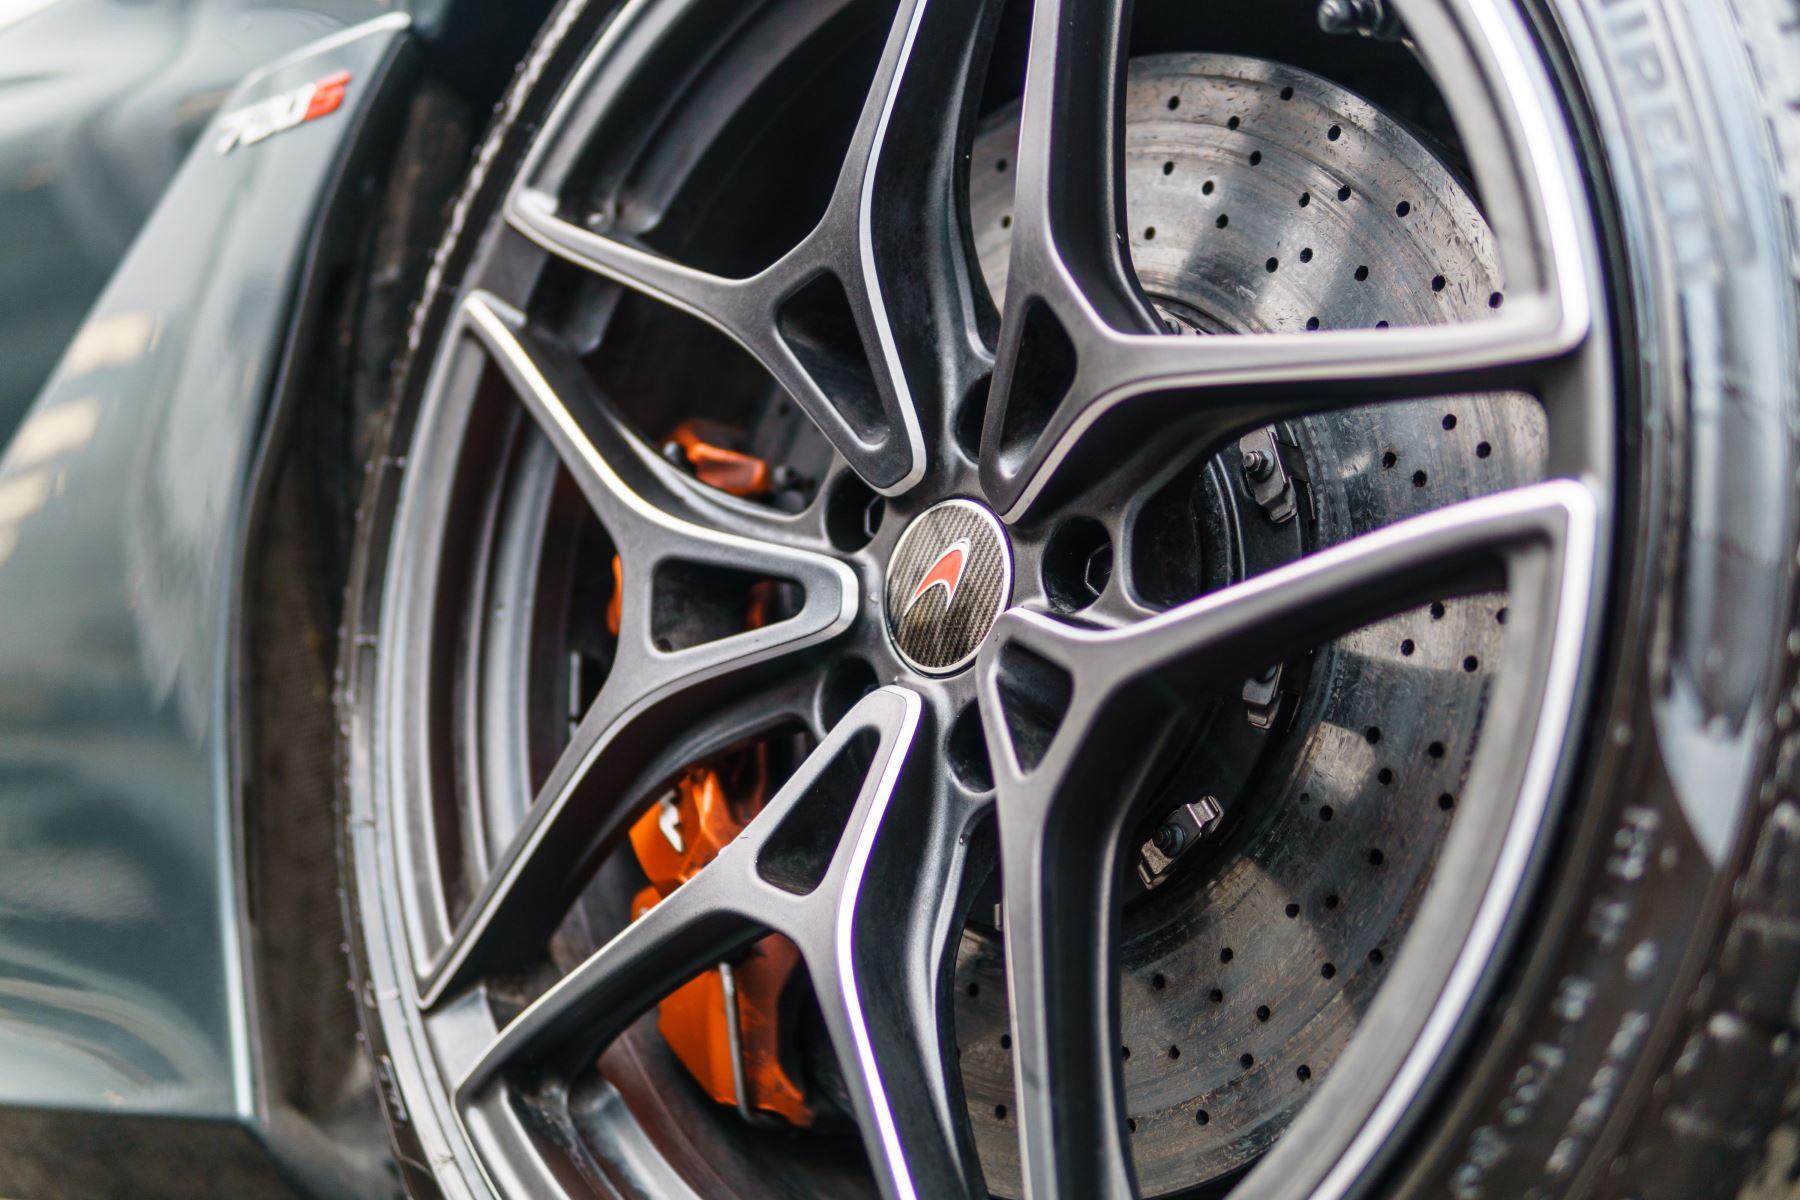 McLaren 720S Performance V8 Coupe SSG image 22